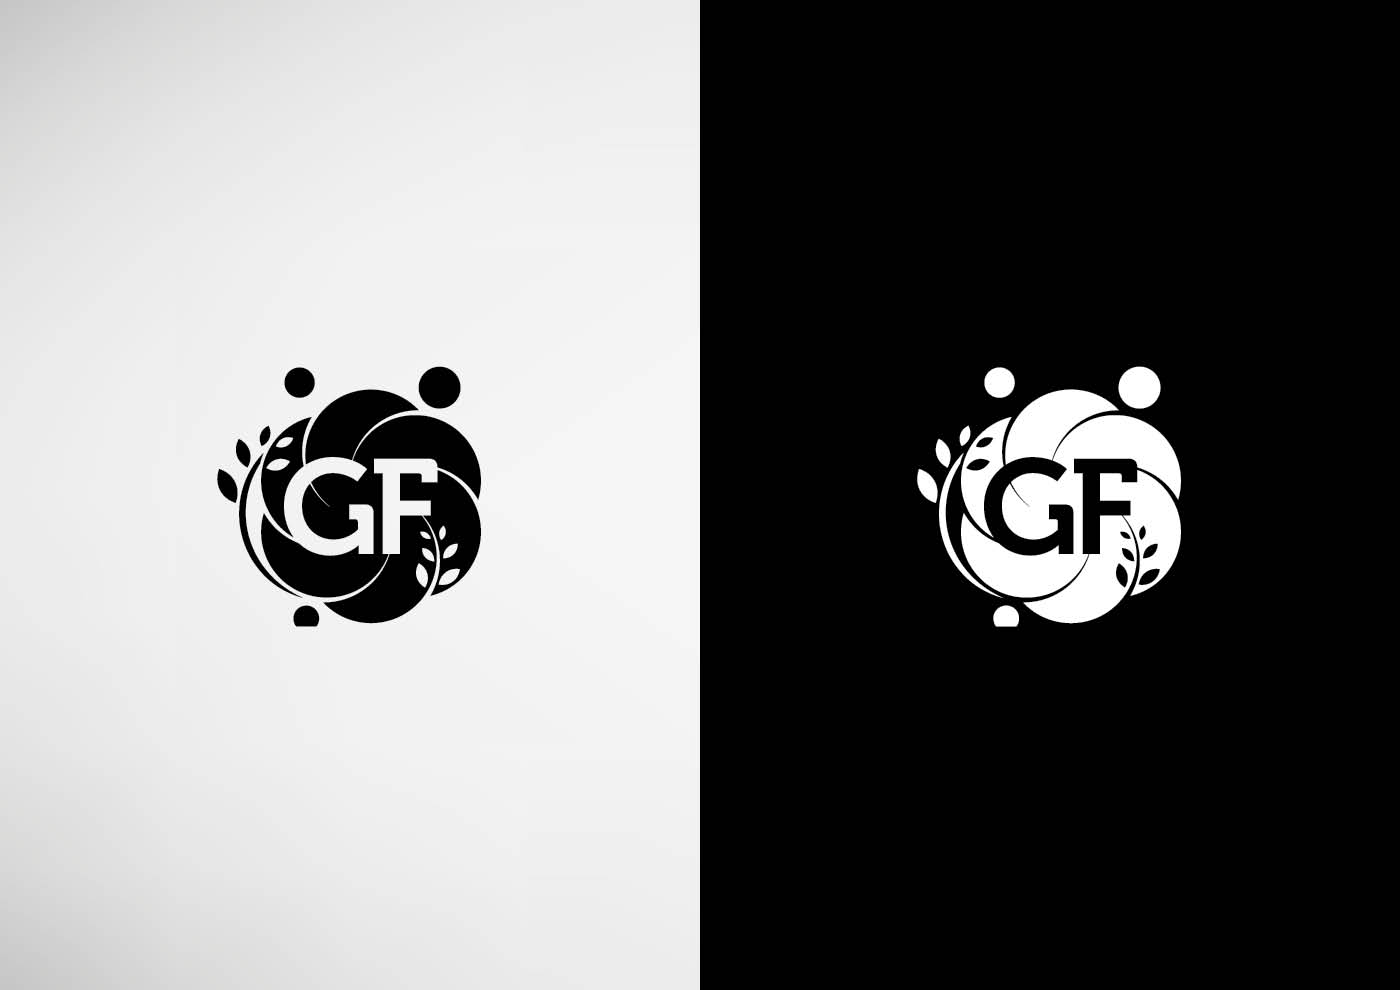 Gerontos Formación - Imagen corporativa - Ivan Diez